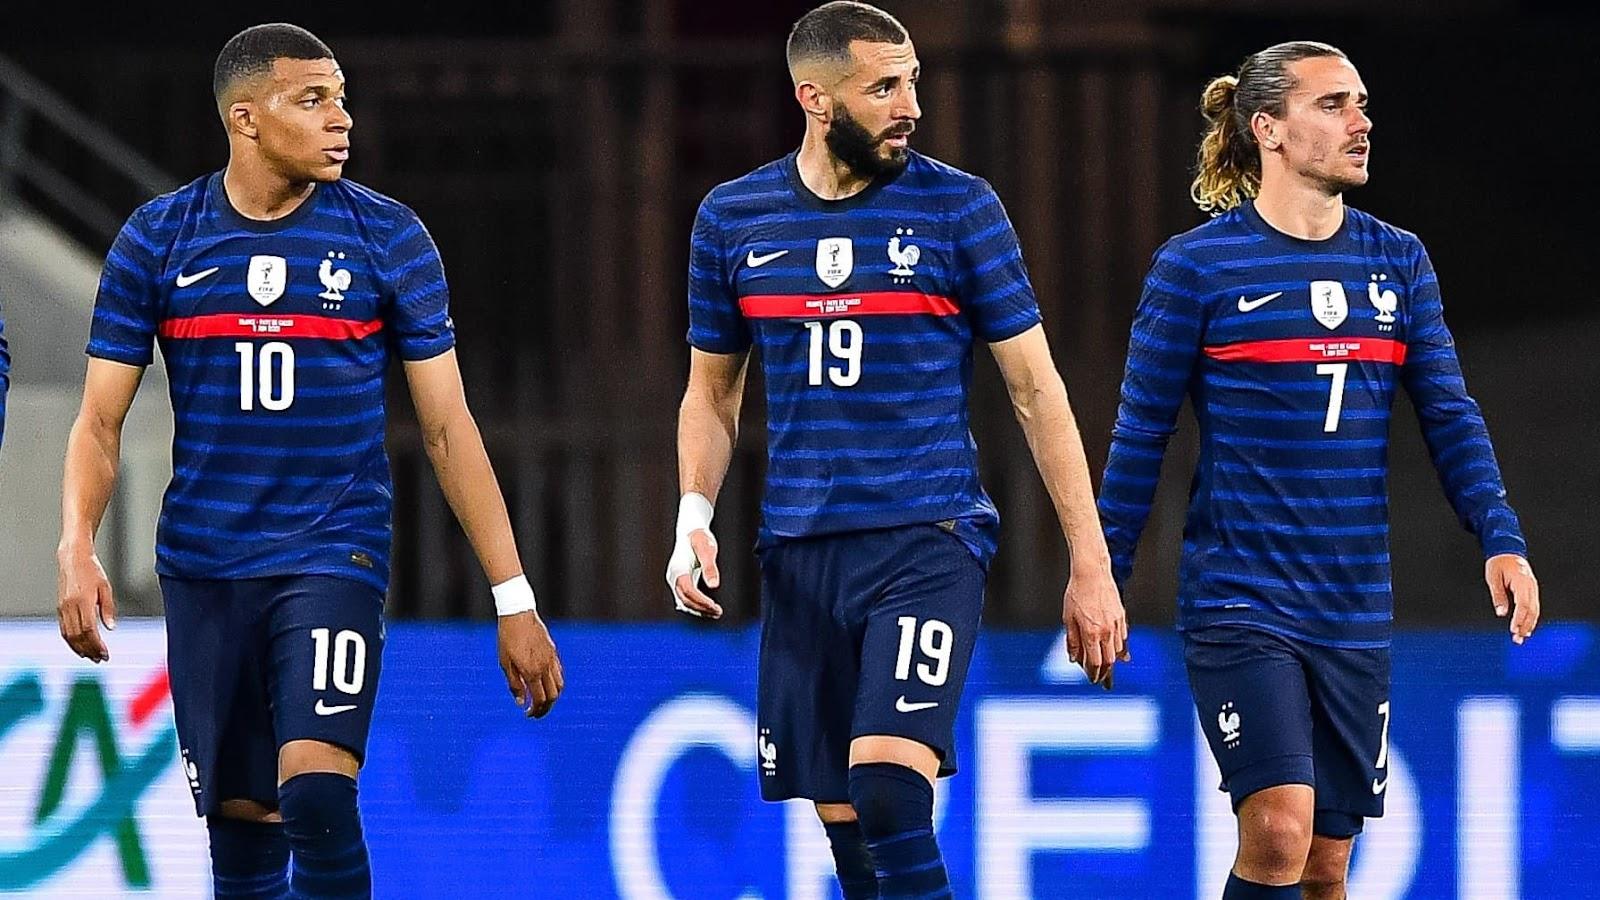 Kylian Mbappe, Karim Benzema, and Antoine Griezmann in France jerseys